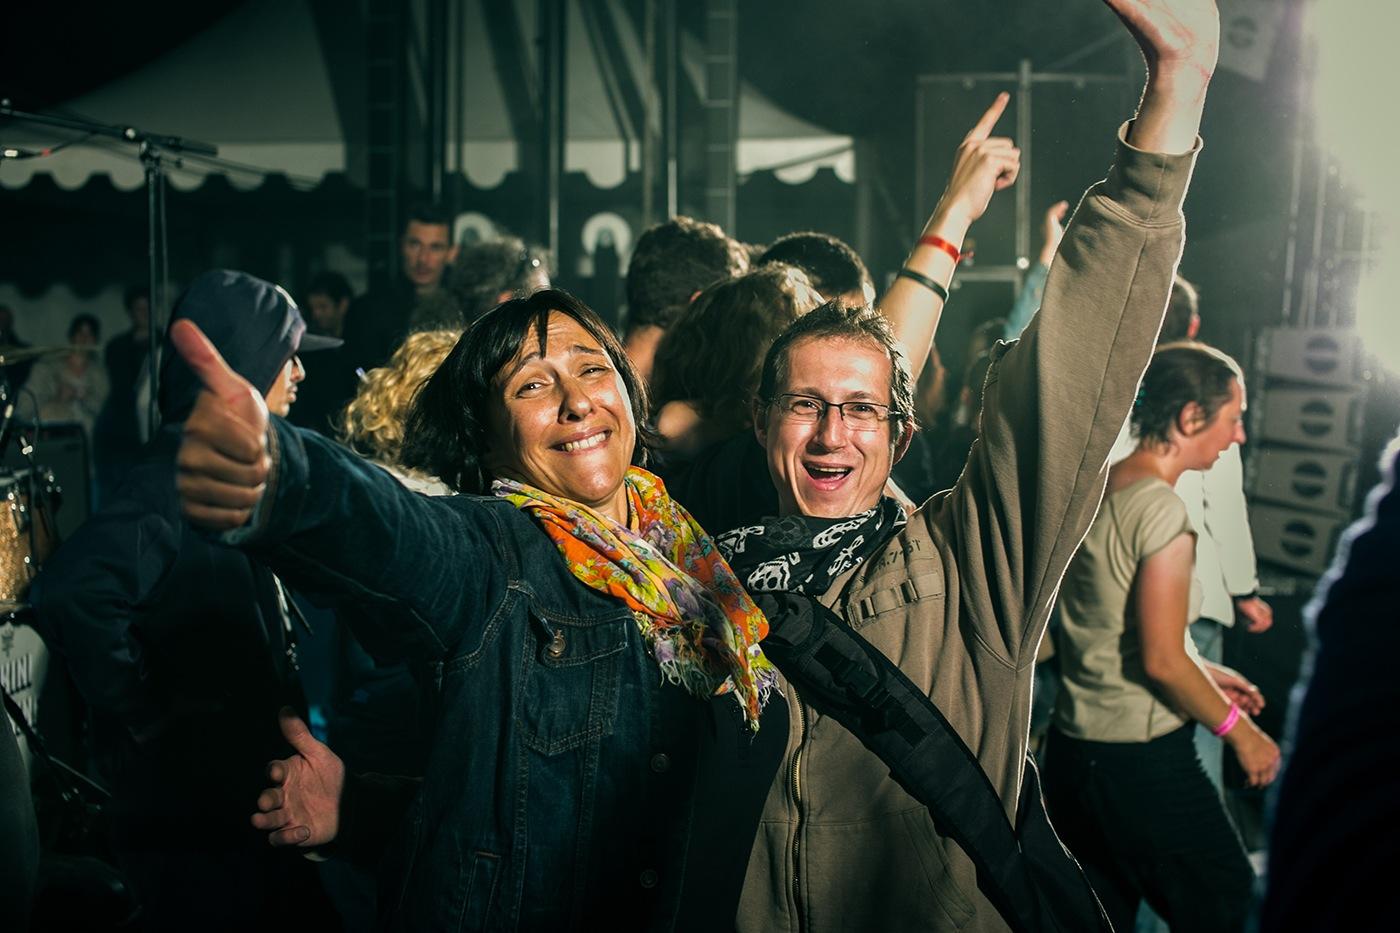 photographe-reportage-festival-rockadel-guillaume-heraud-028-small